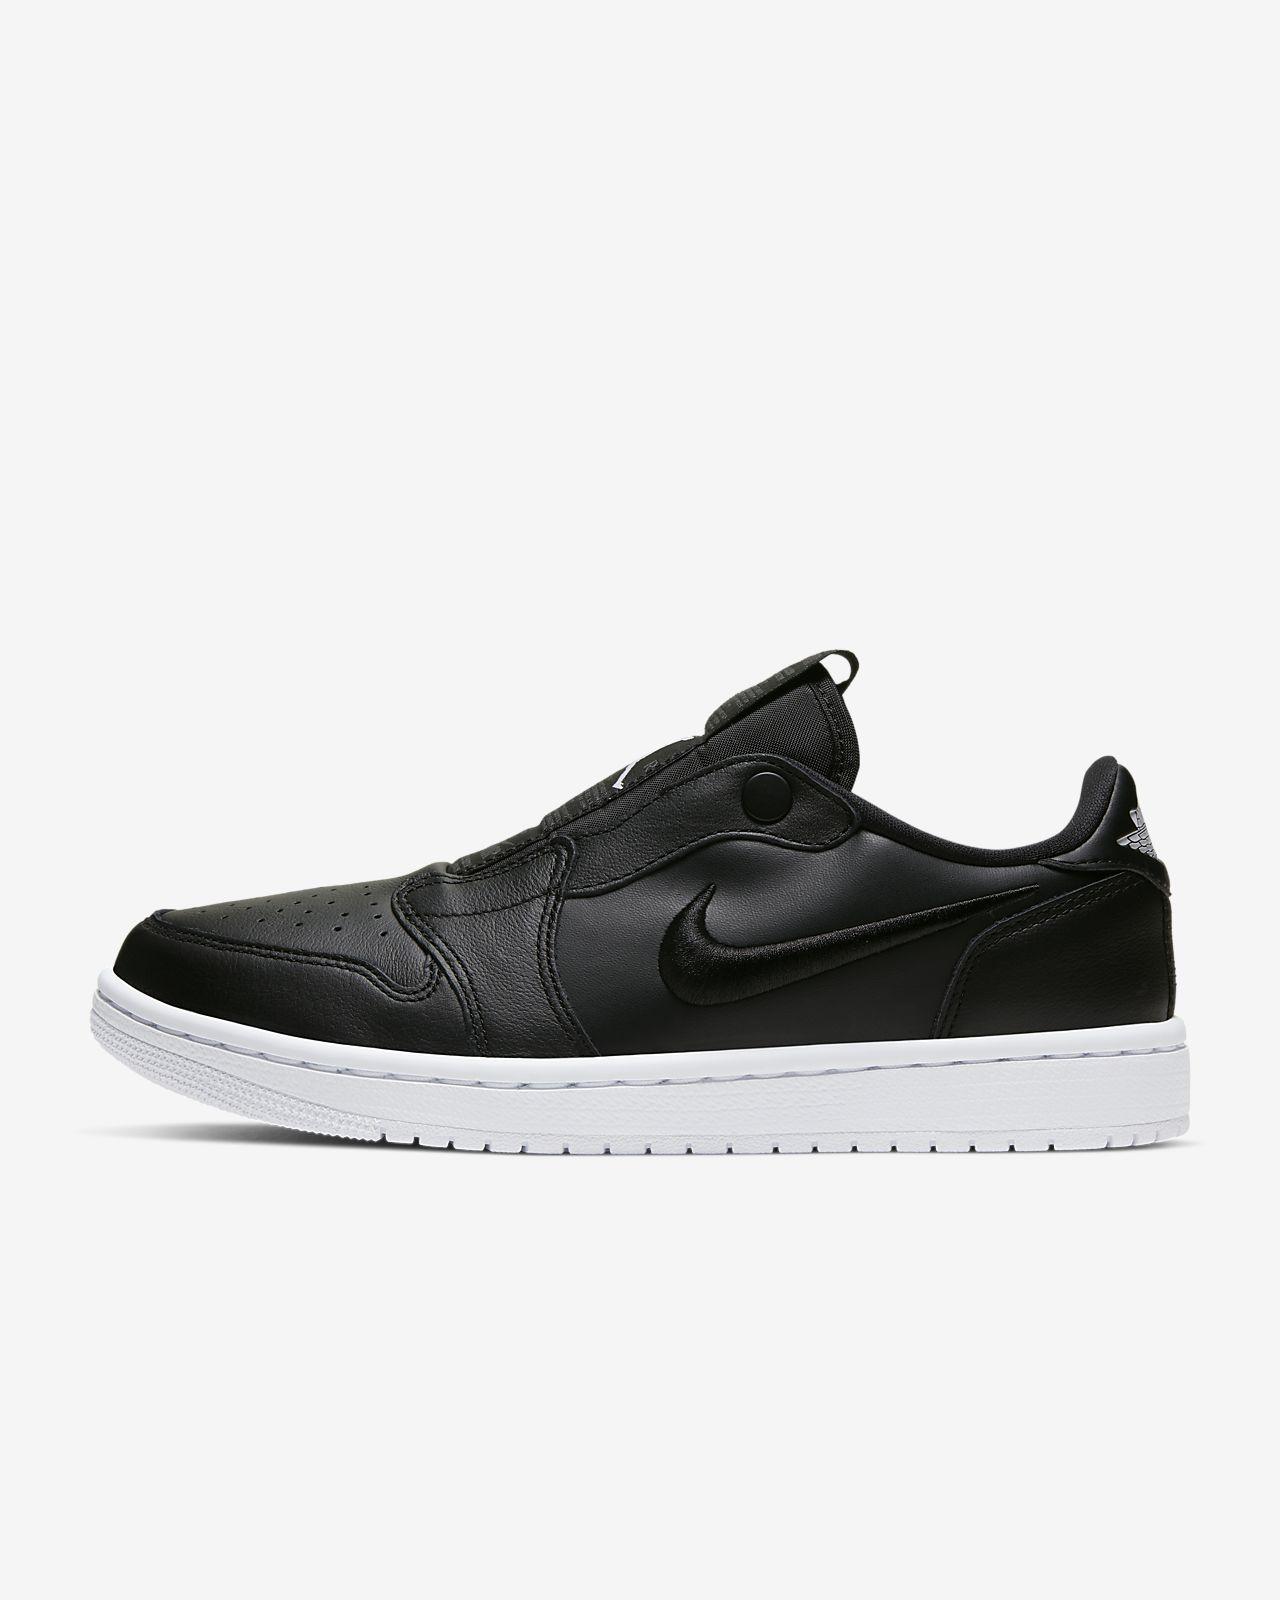 Air Jordan 1 Retro Low Slip Zapatillas - Mujer